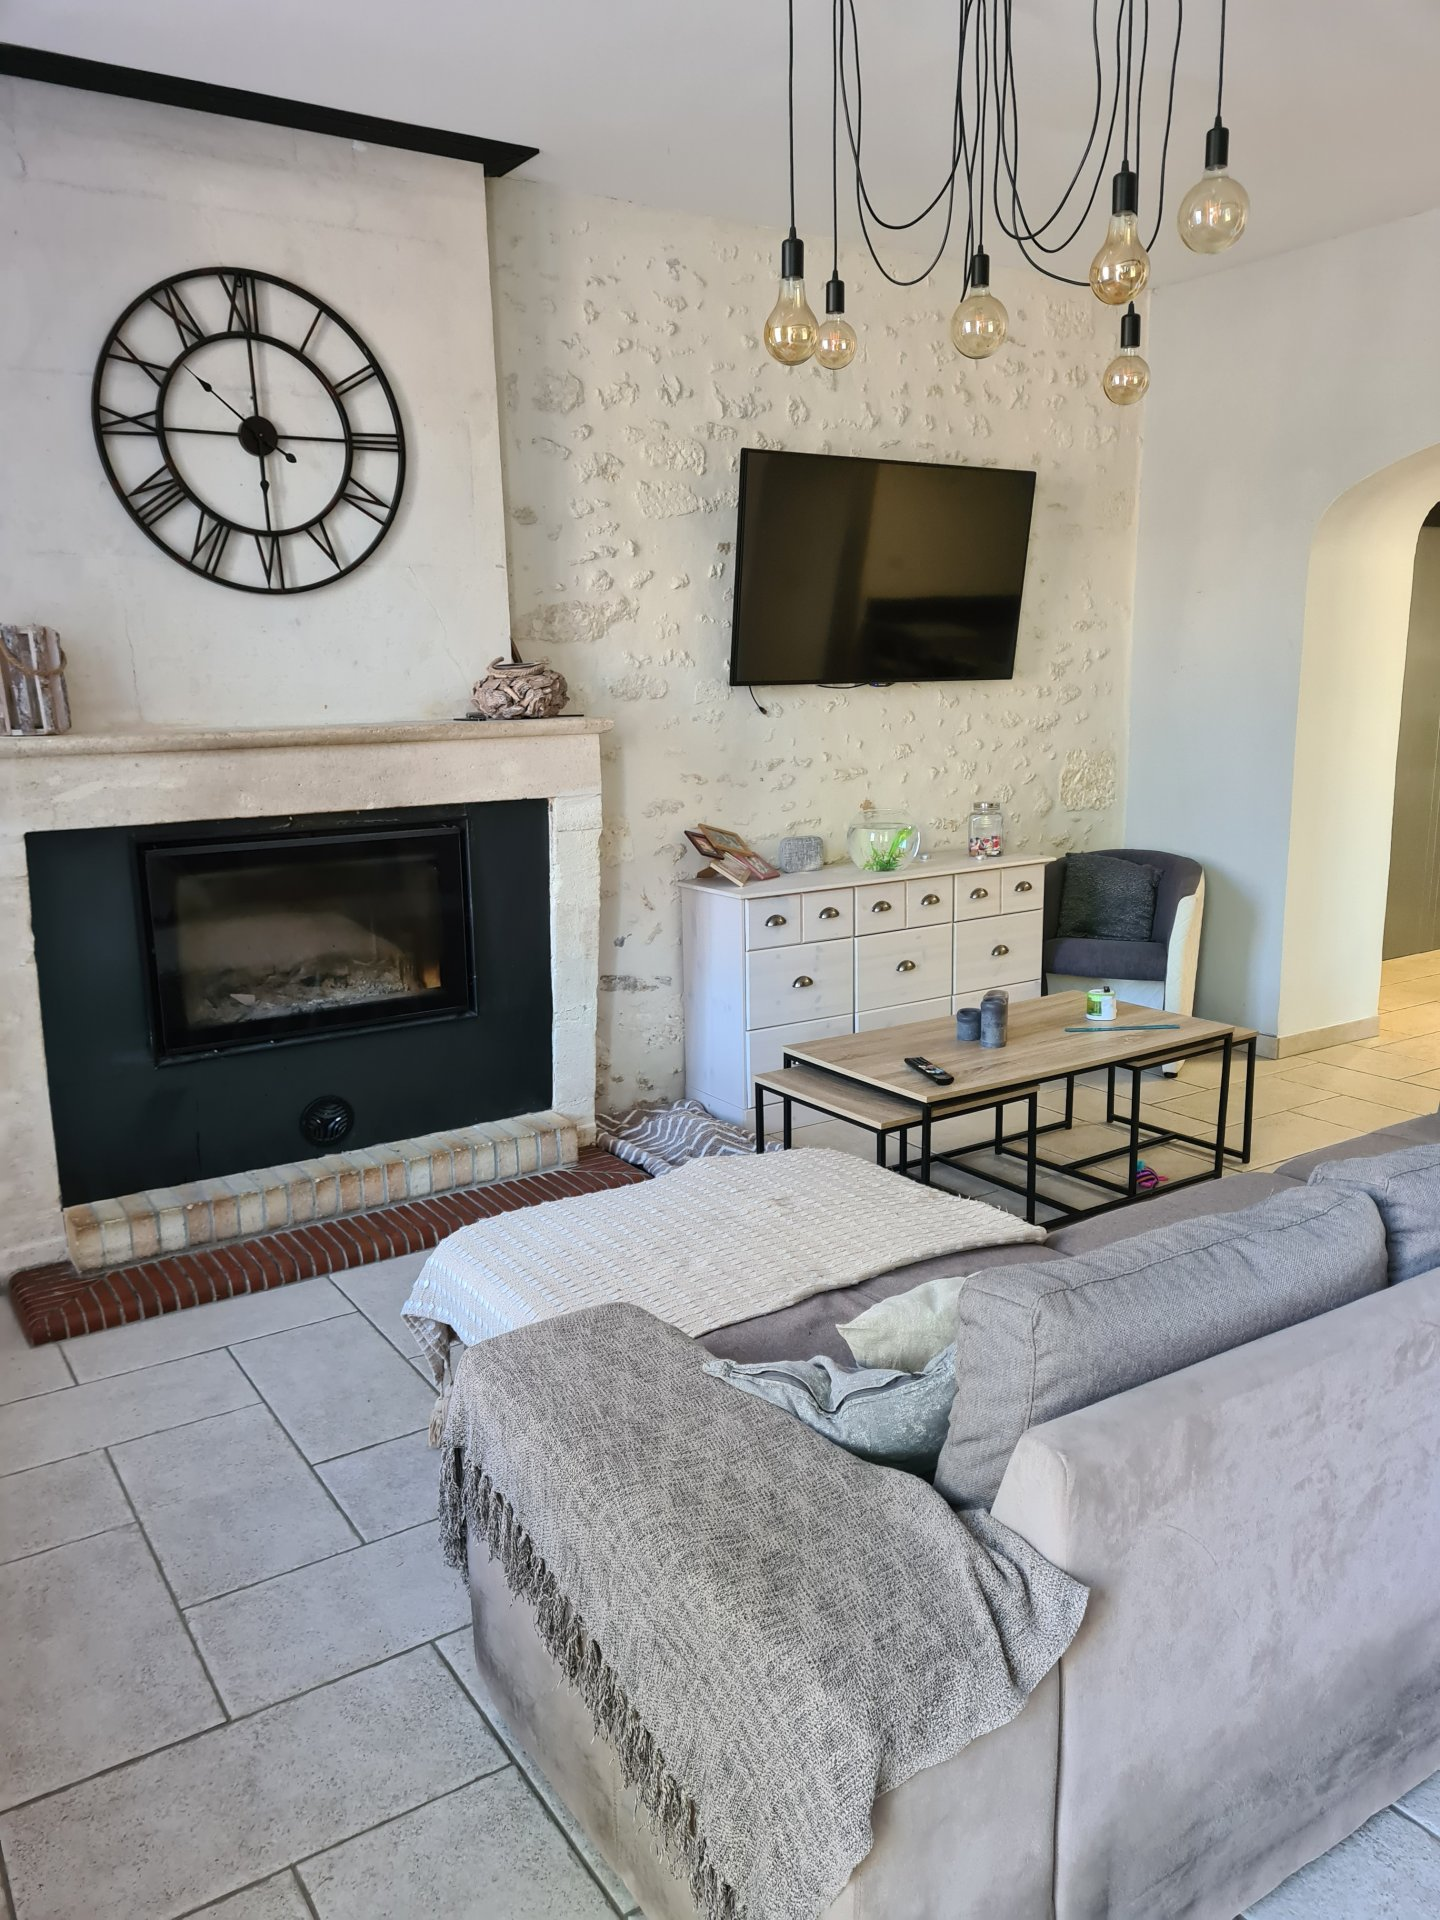 Maison charentaise 180 m²